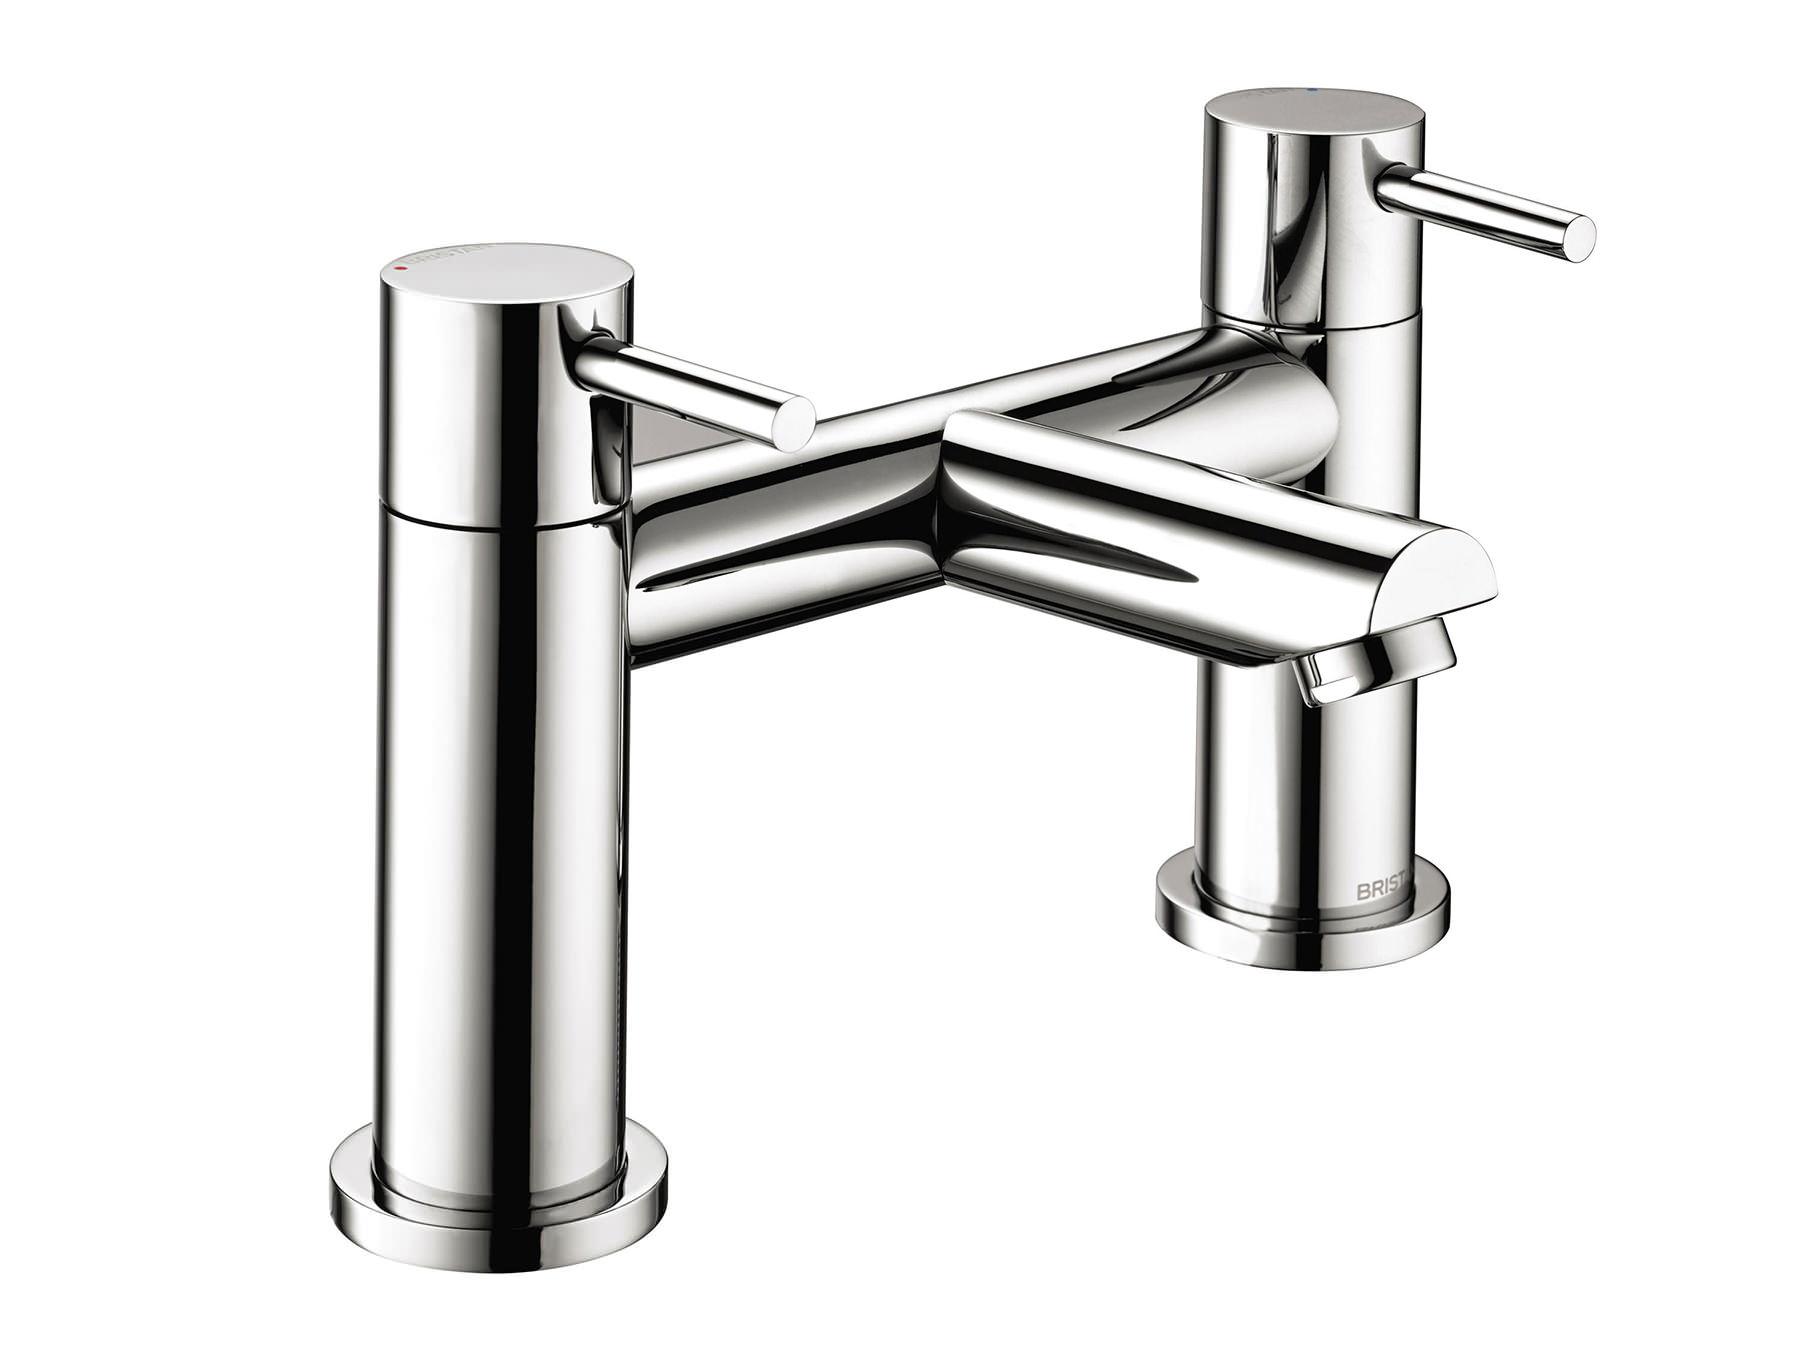 Chrome Bristan Kitchen Taps: Bristan Blitz Bath Filler Tap Chrome